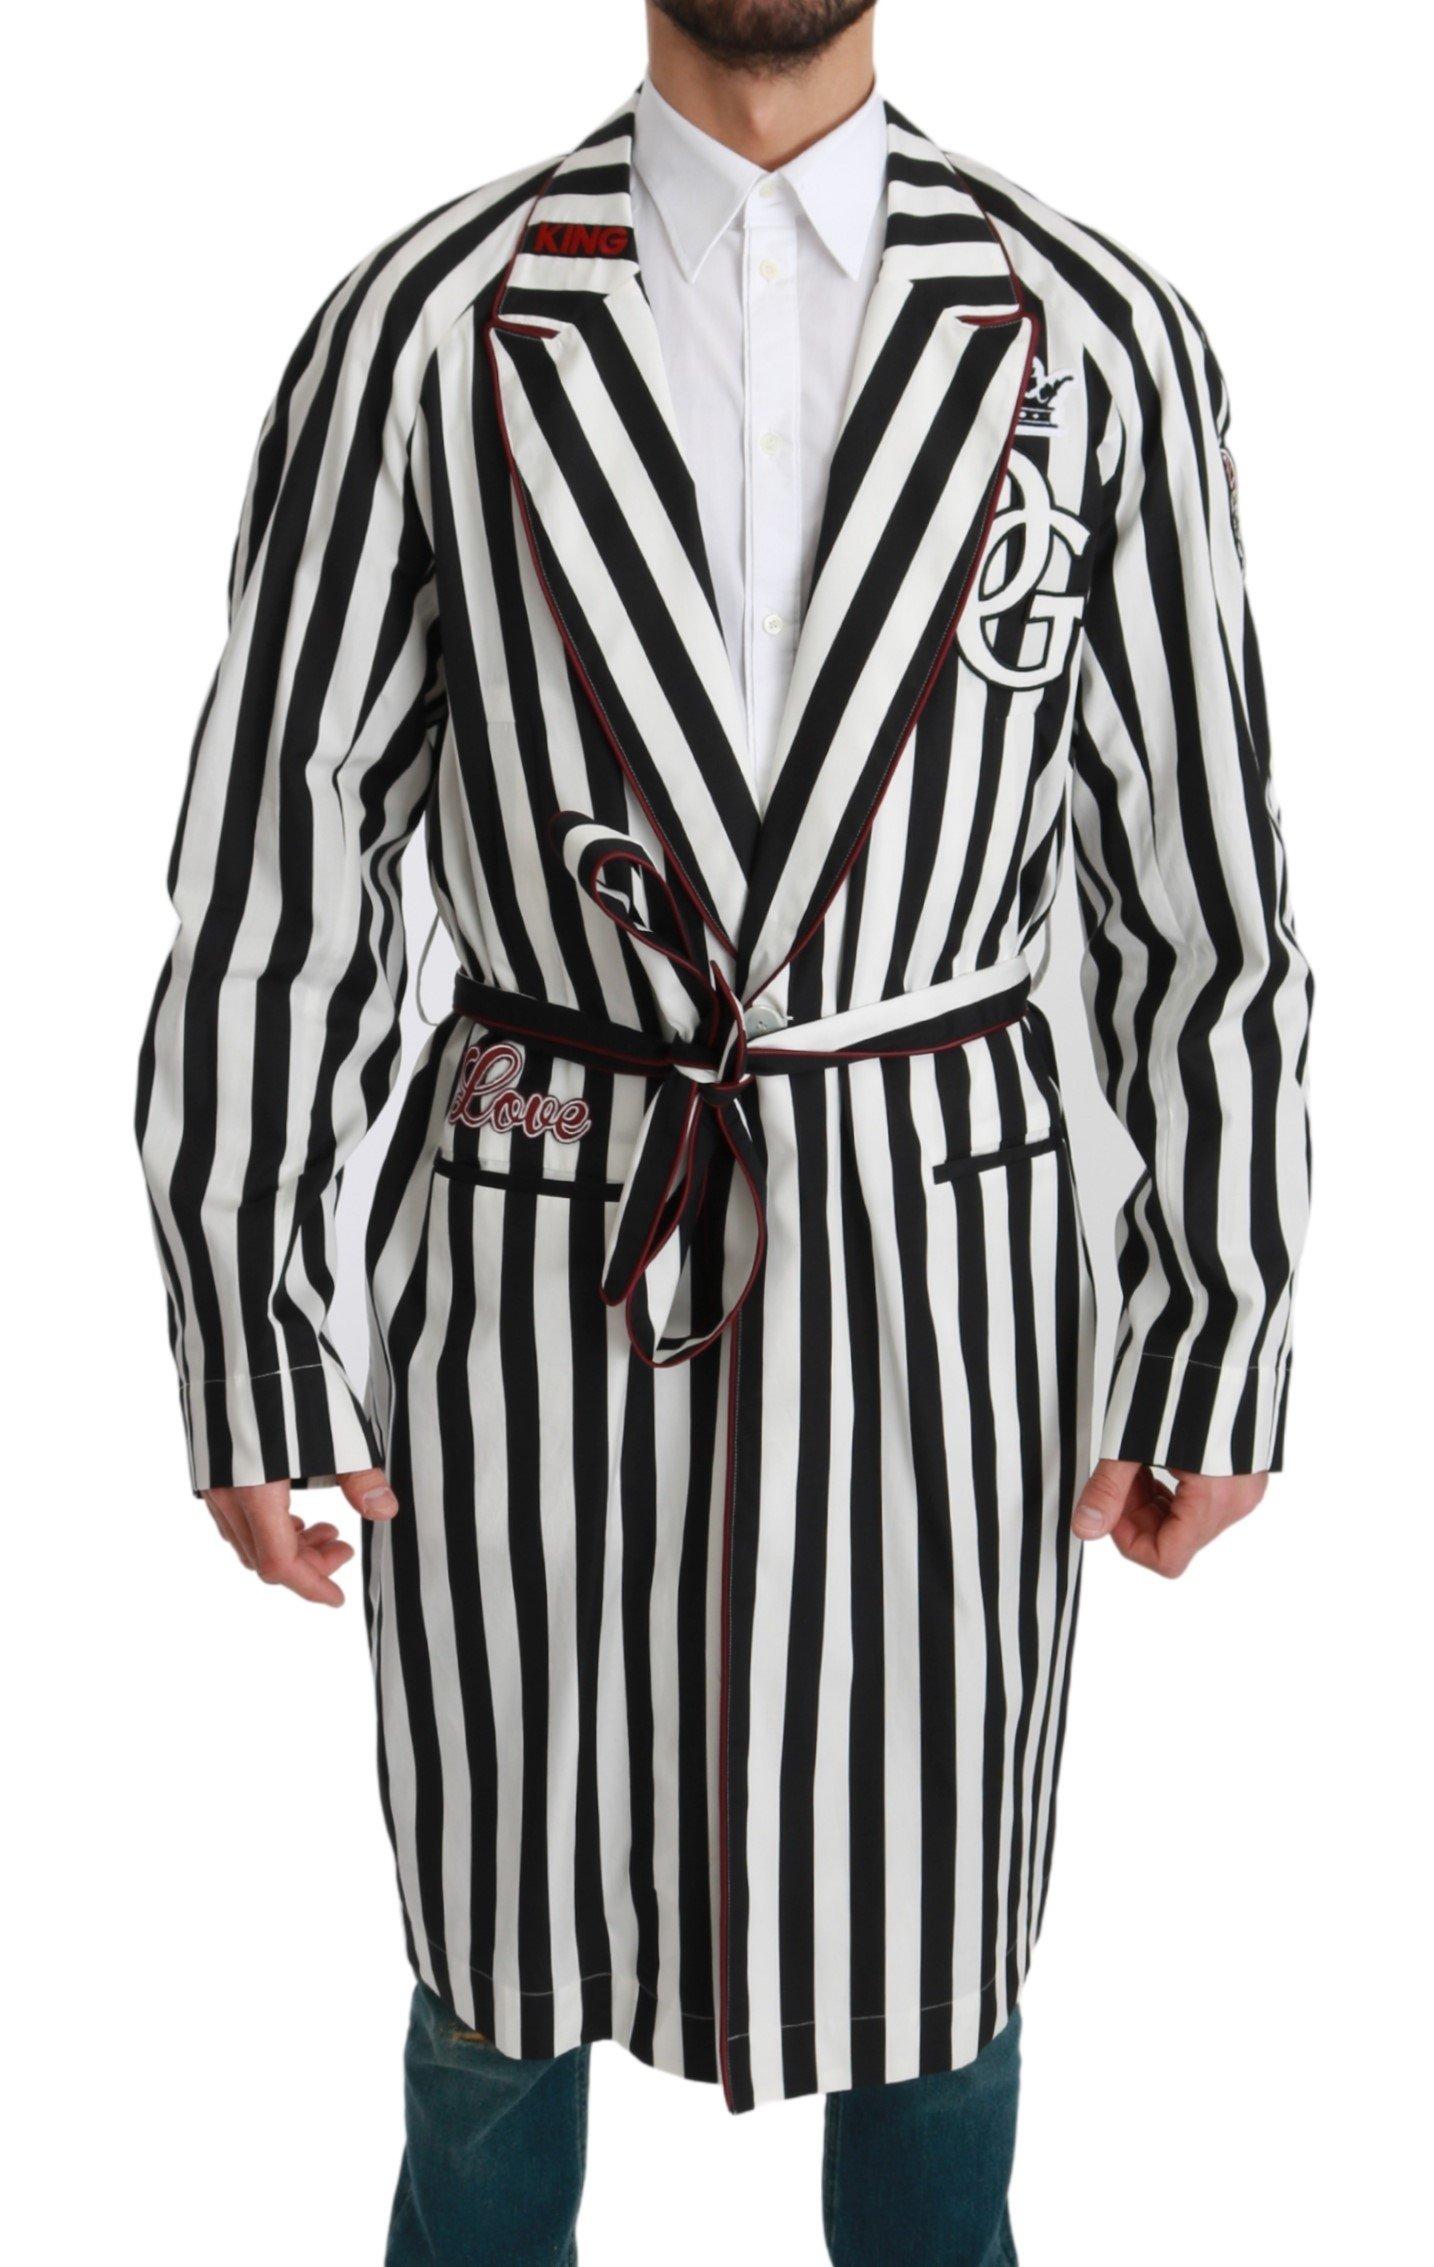 Dolce & Gabbana Men's Cotton Robe Nightgown Multicolor JKT2613 - IT46 | S